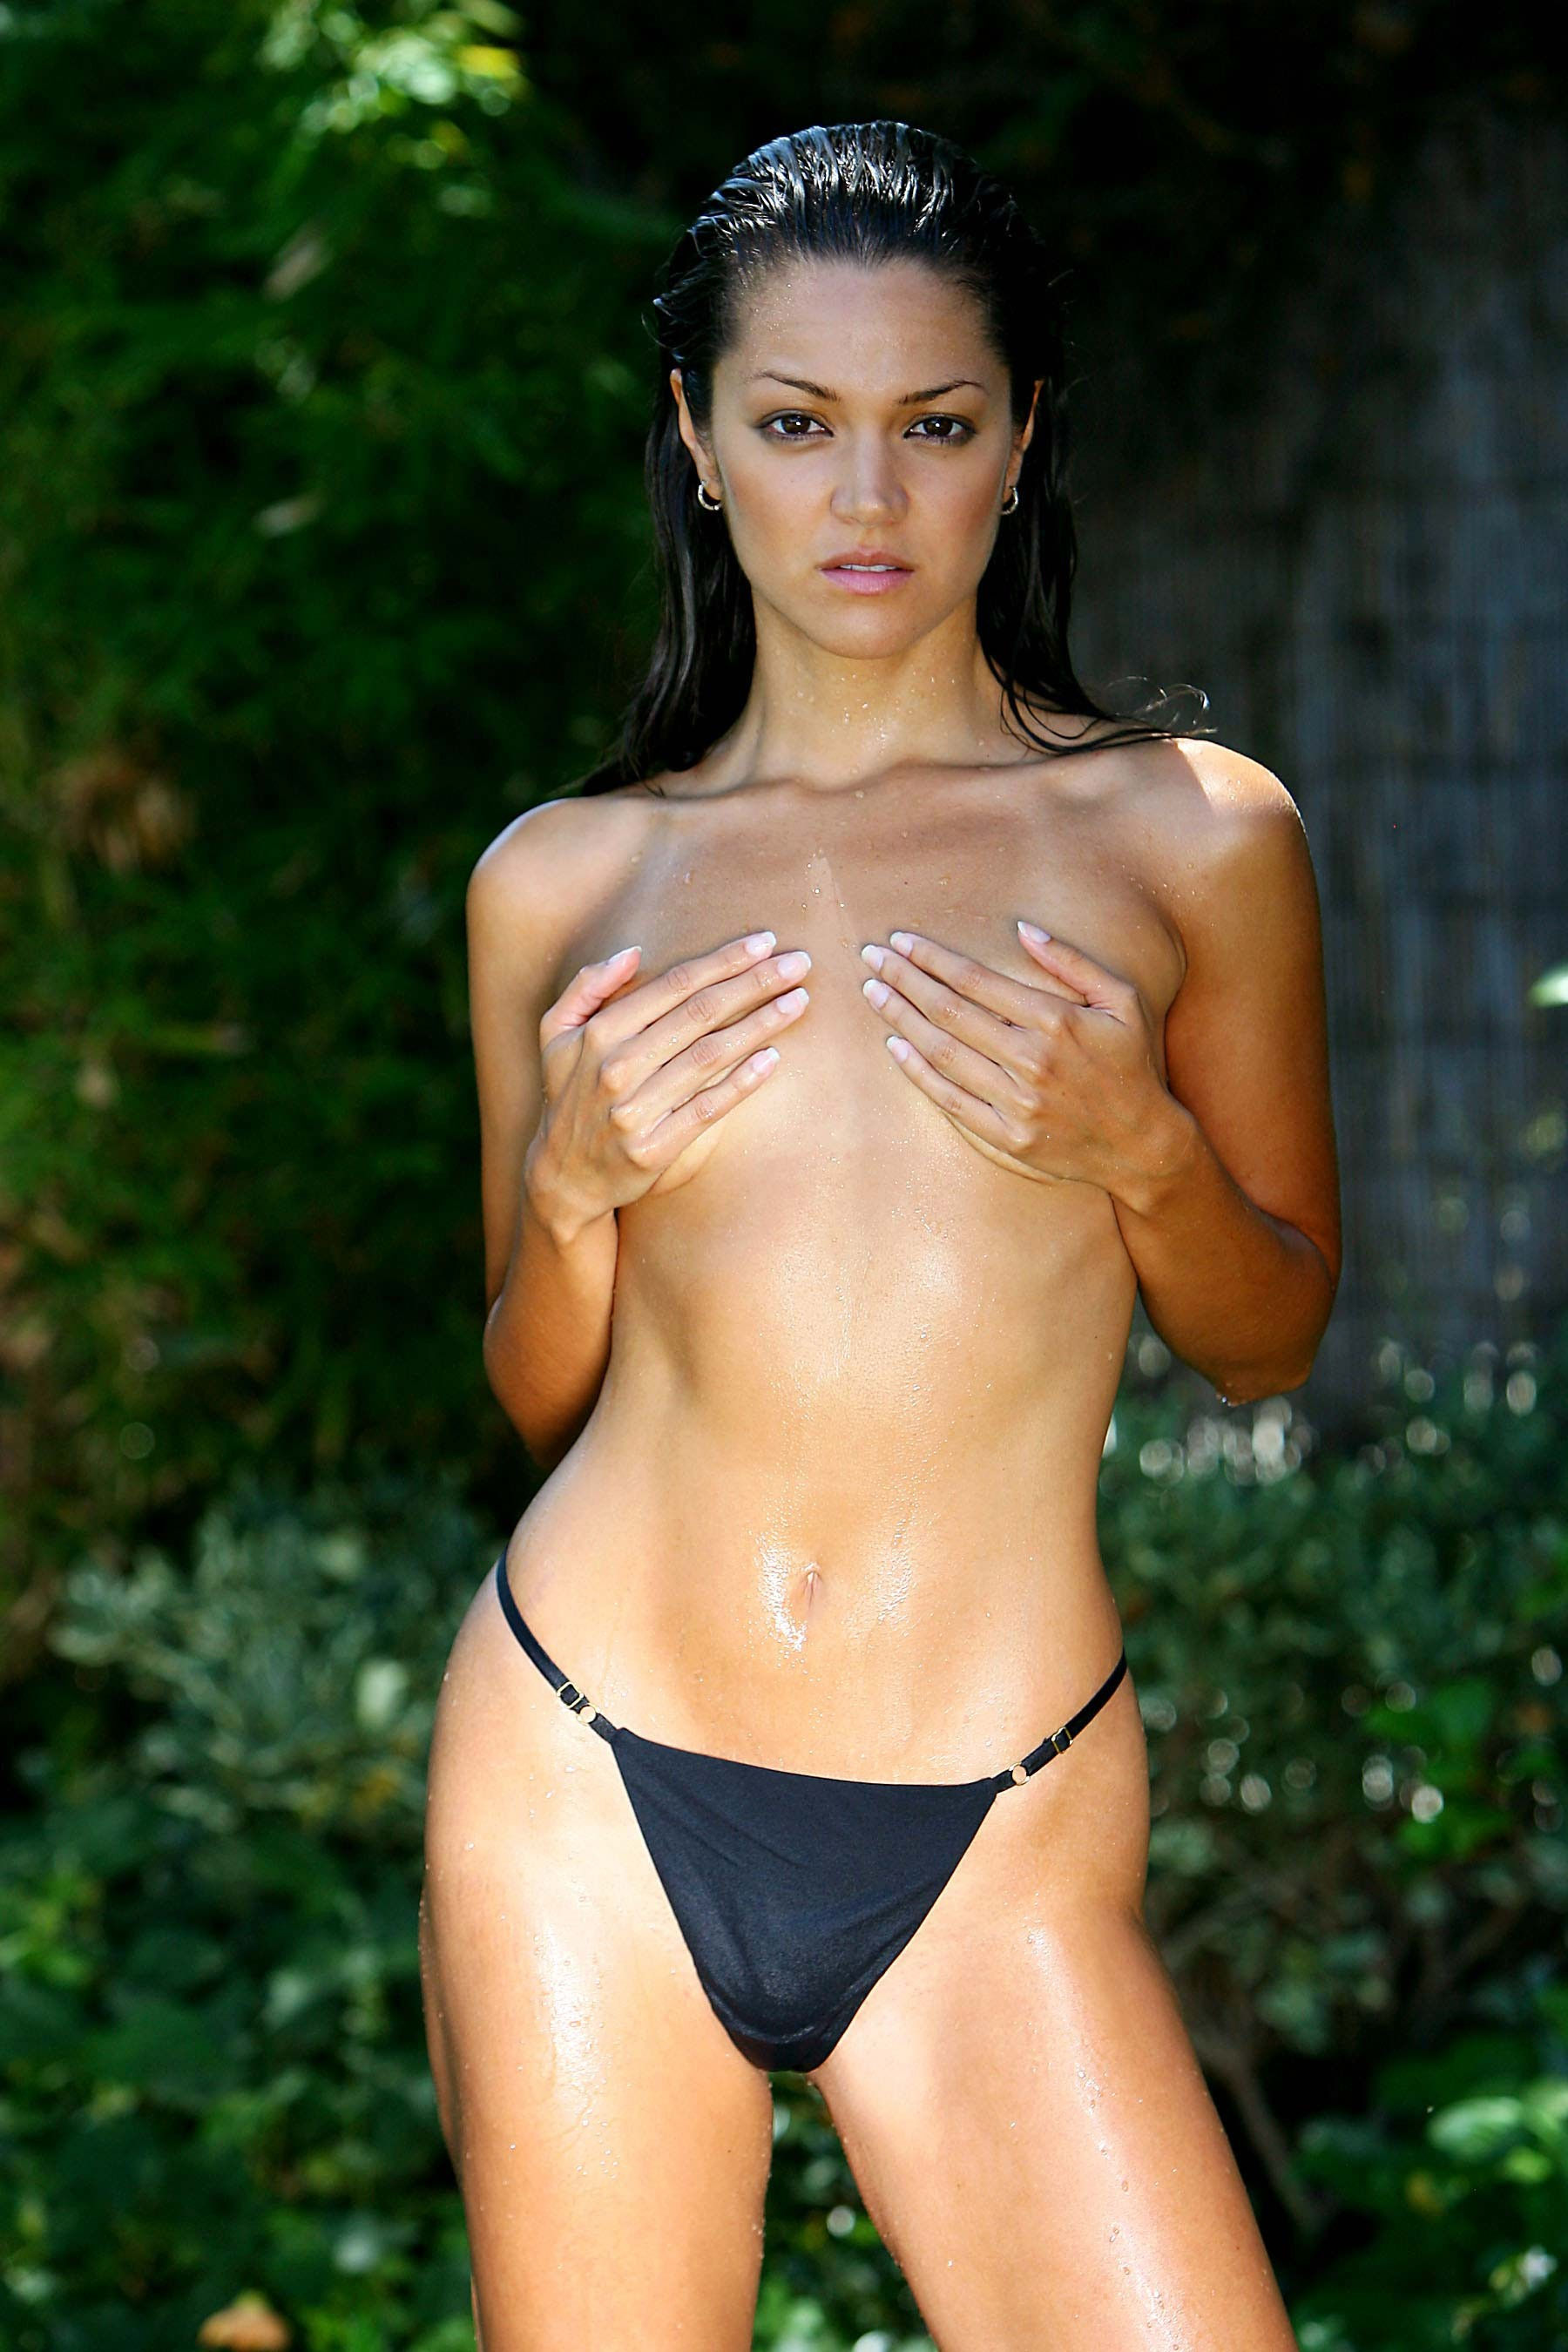 Kristanna sommer loken fake nude